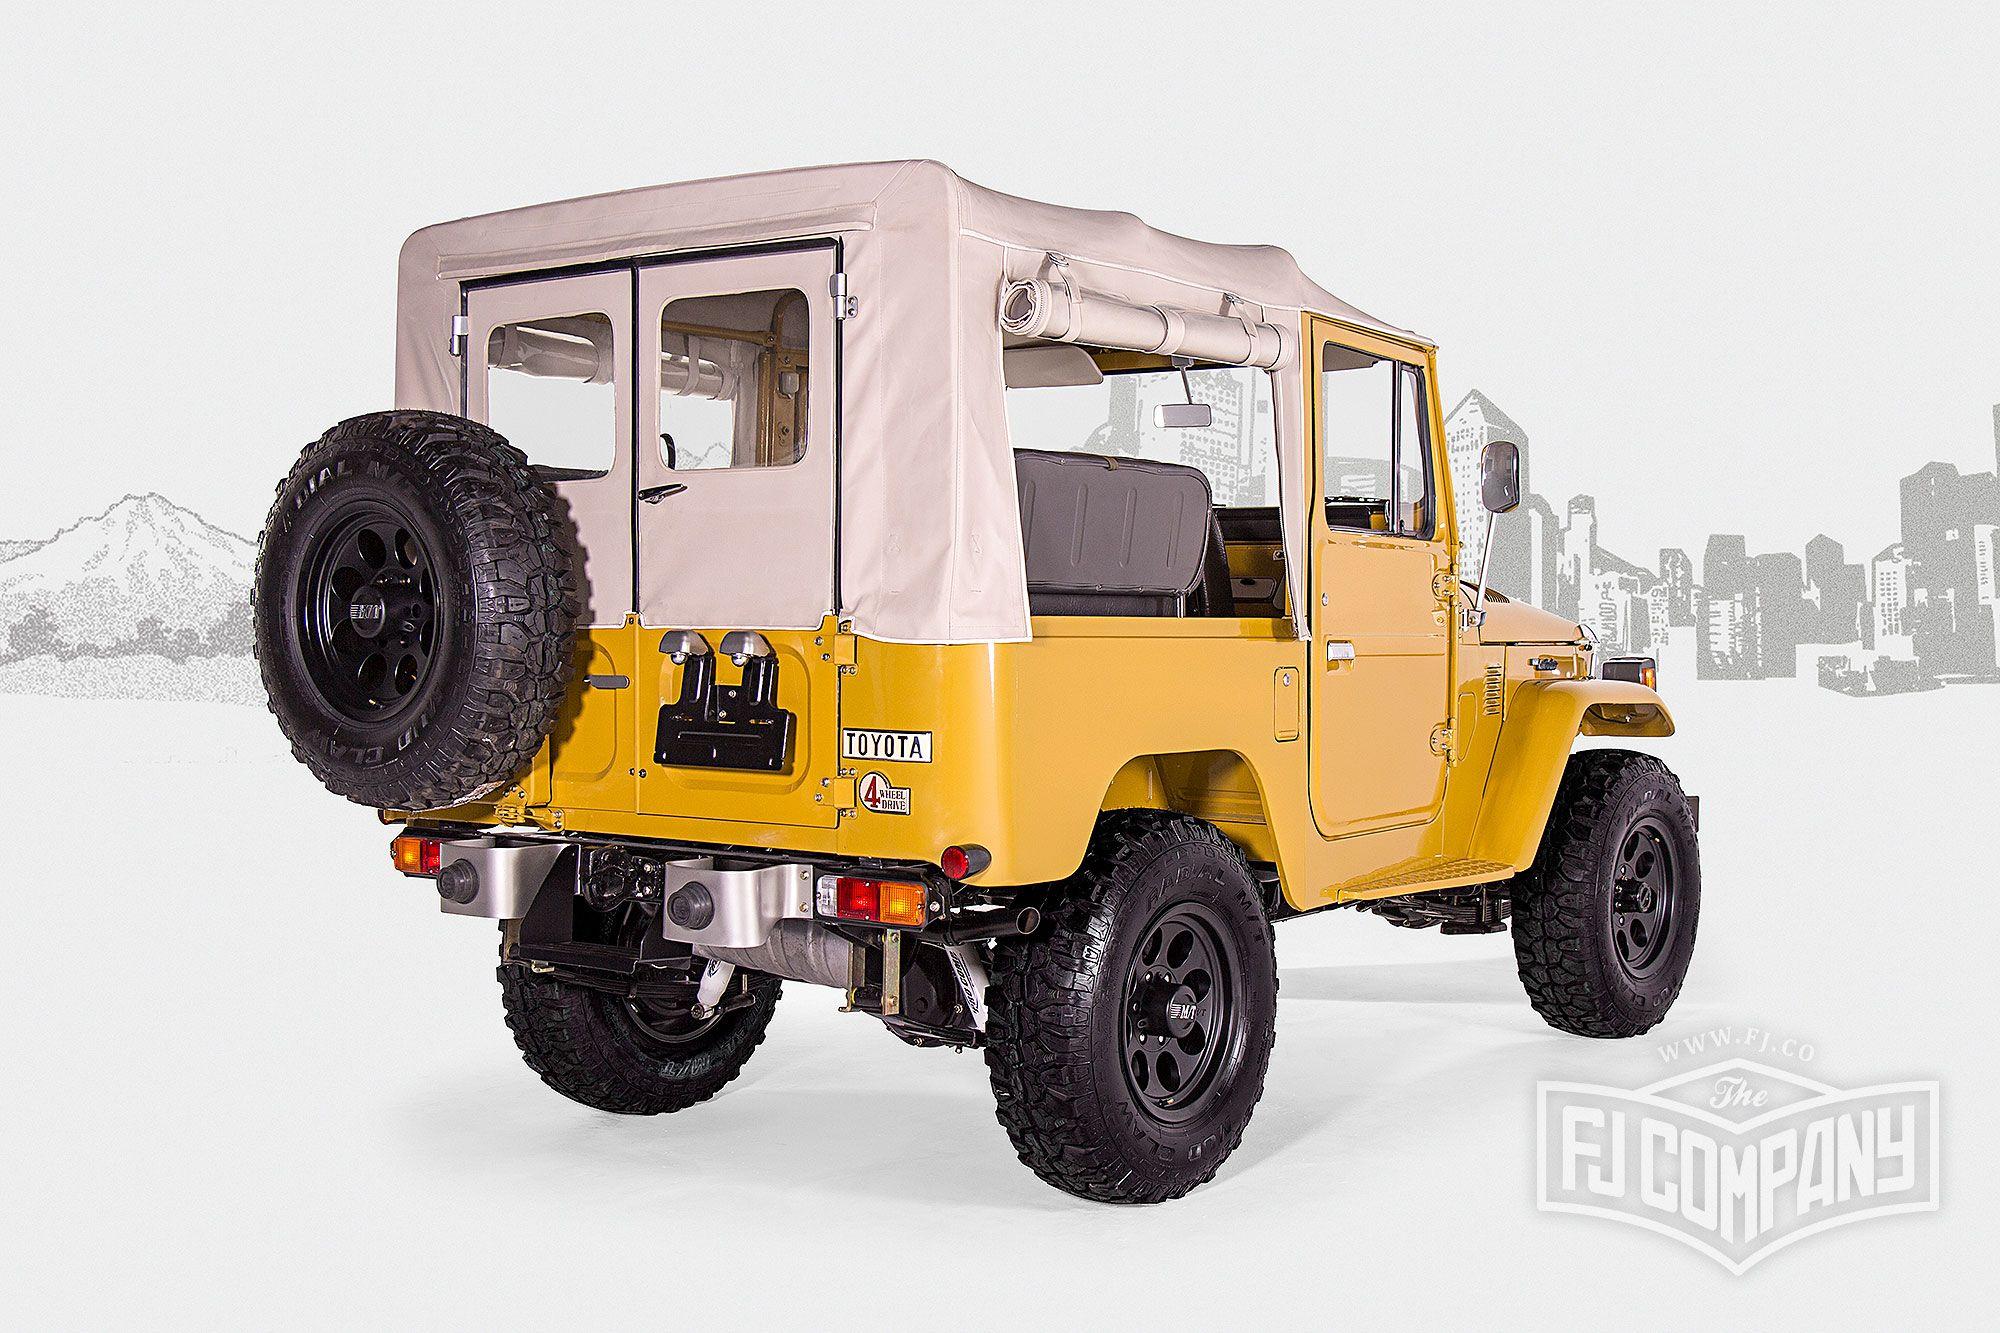 1976 Toyota Land Cruiser FJ40 Yellow #fjco1976yellow #fjcompany #fj40 #toyota #landcruiser #fjrestoration